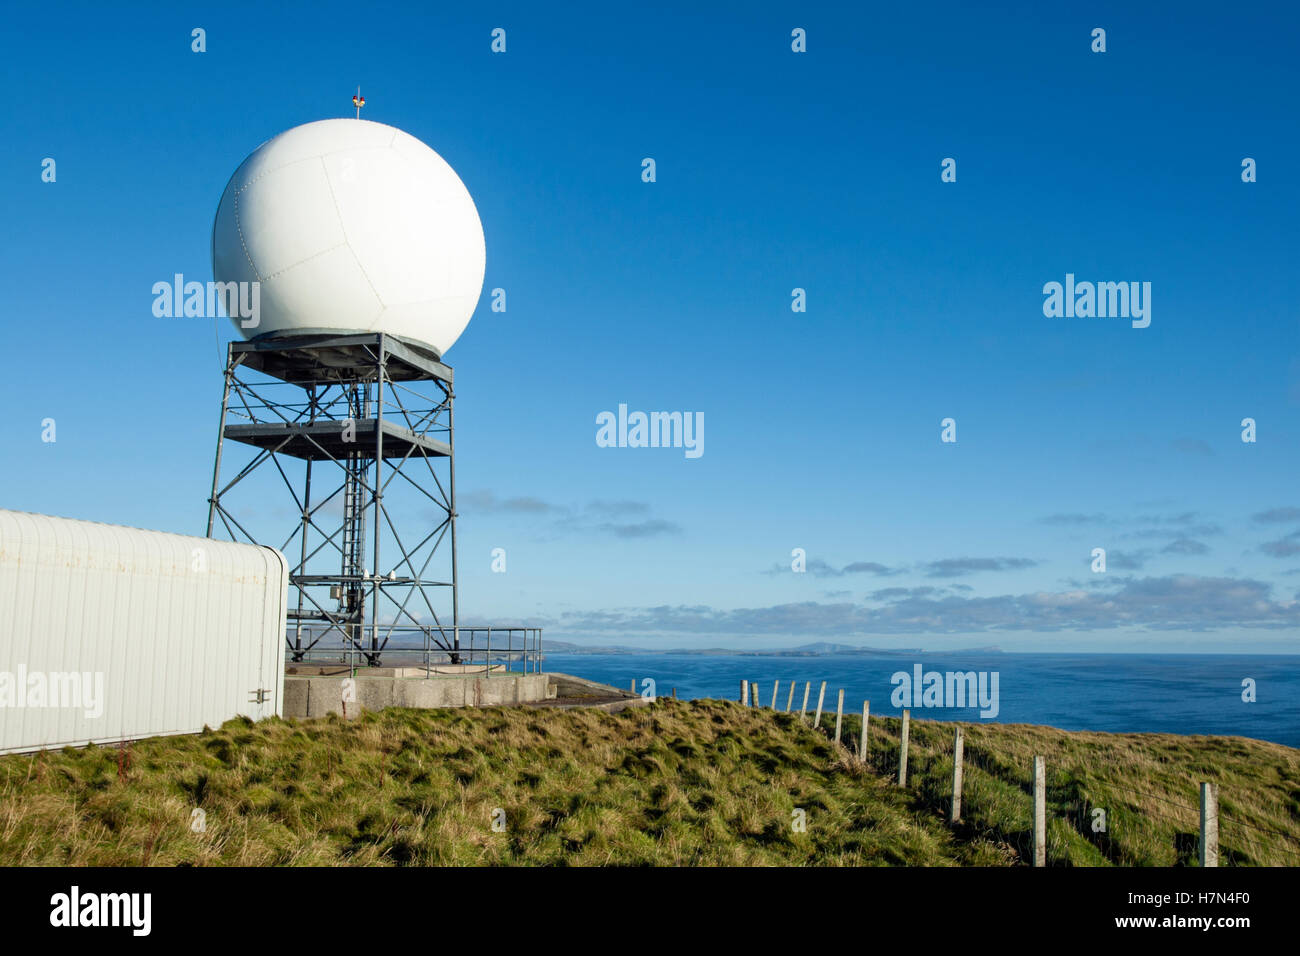 Radar dome at Compass Head, Mainland Shetland - Stock Image